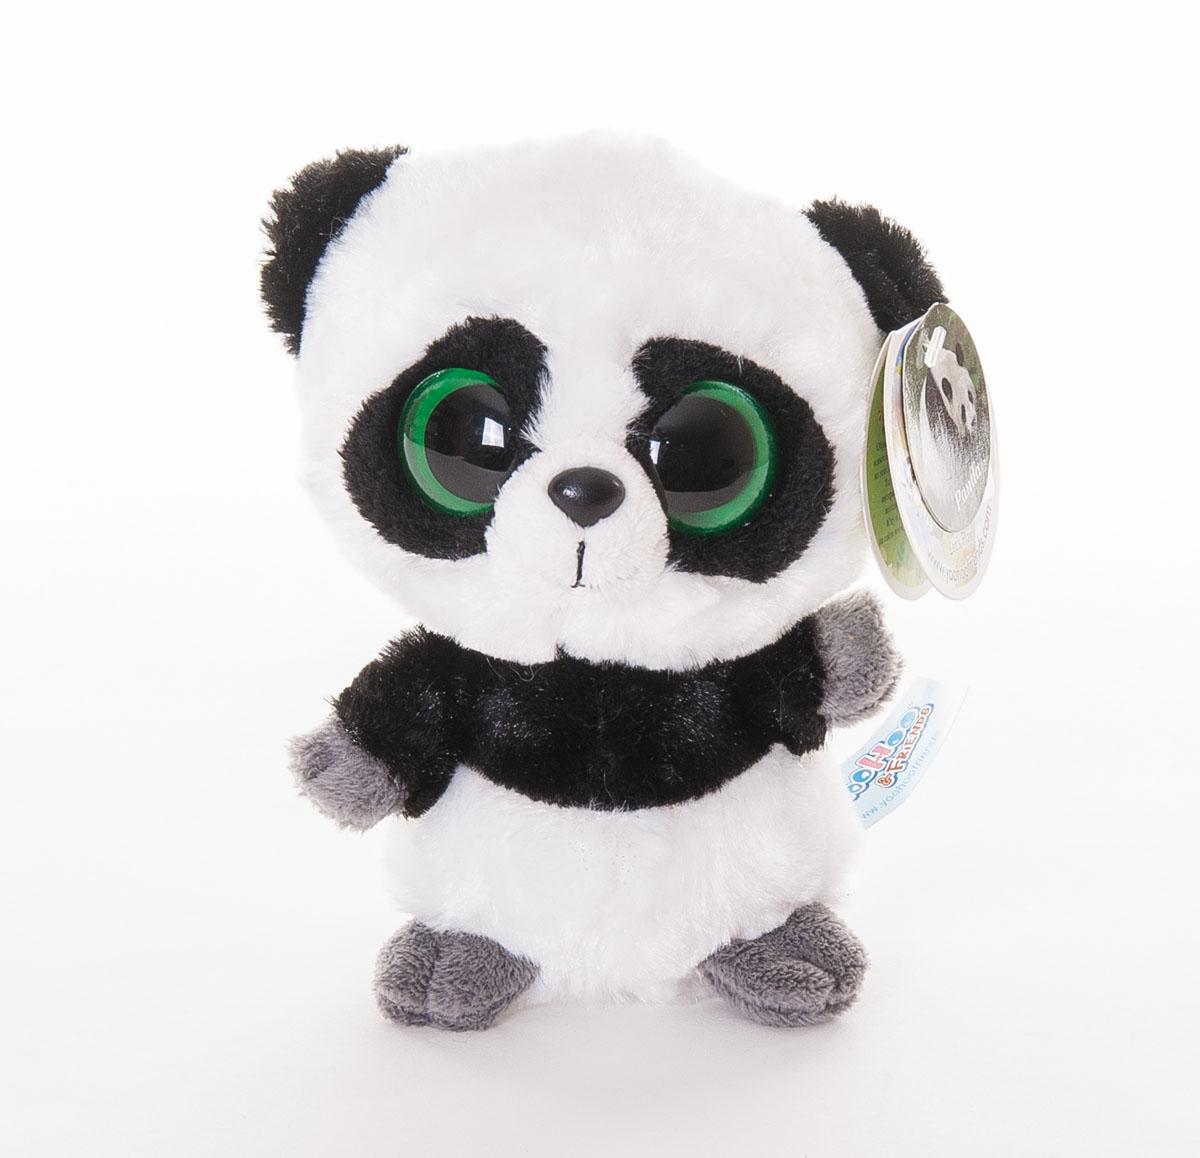 Aurora Мягкая игрушка Панда 12 см aurora мягкая игрушка панда